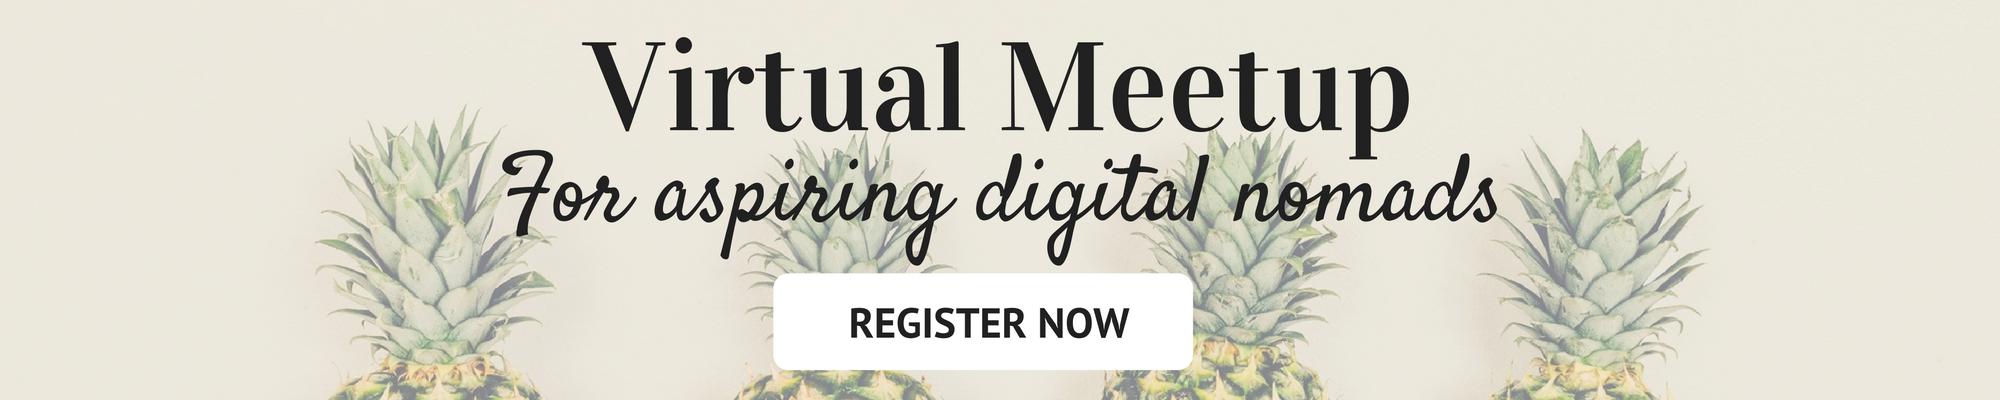 virtual-meet-up-for-aspiring-digital-nomads